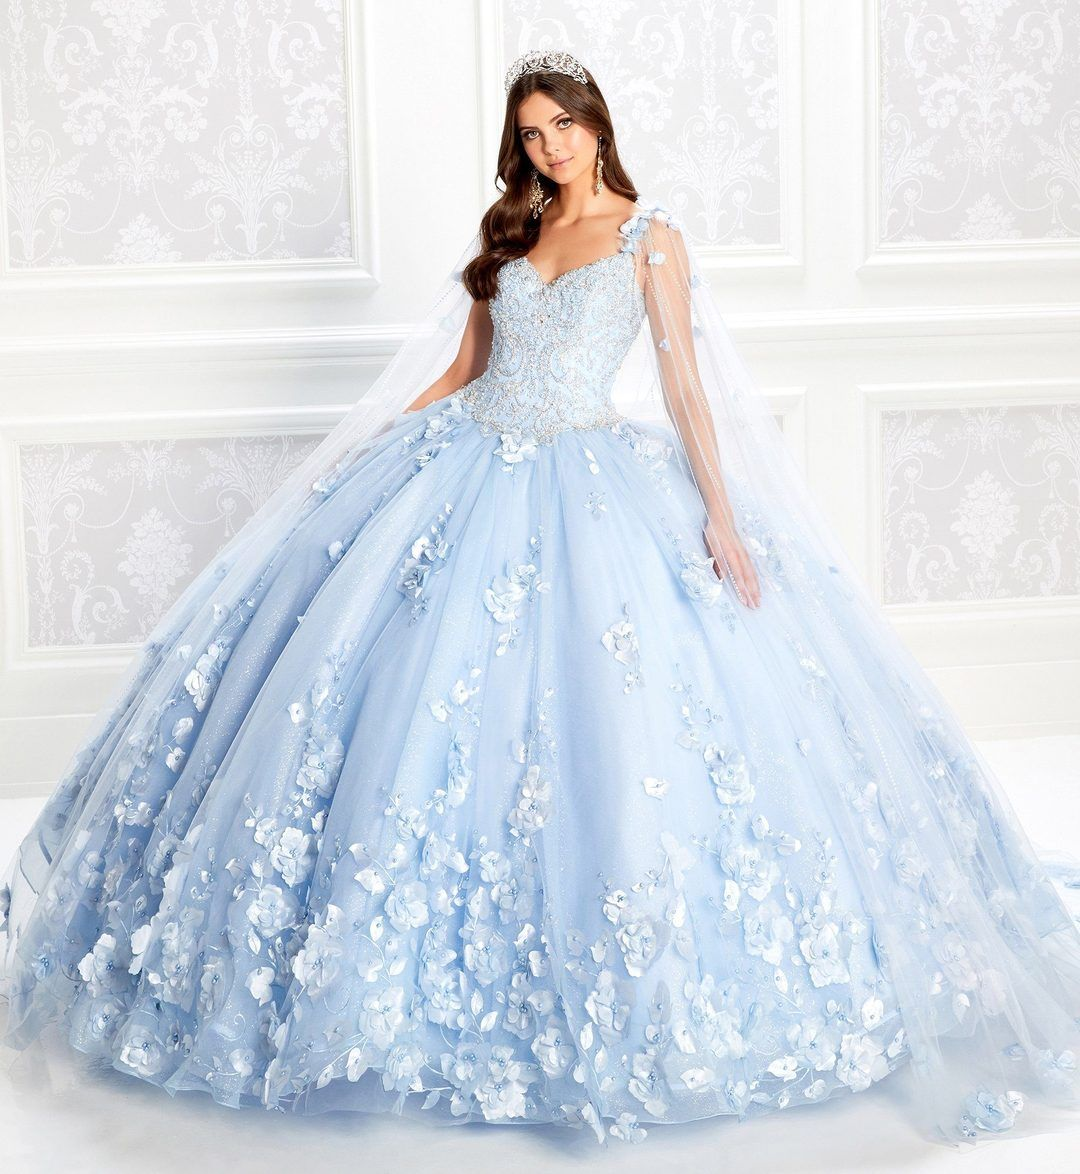 Princesa By Ariana Vara Pr22021nl Quinceanera Dress In 2021 Light Blue Quinceanera Dresses Quinceanera Dresses Blue Pretty Quinceanera Dresses [ 1174 x 1080 Pixel ]